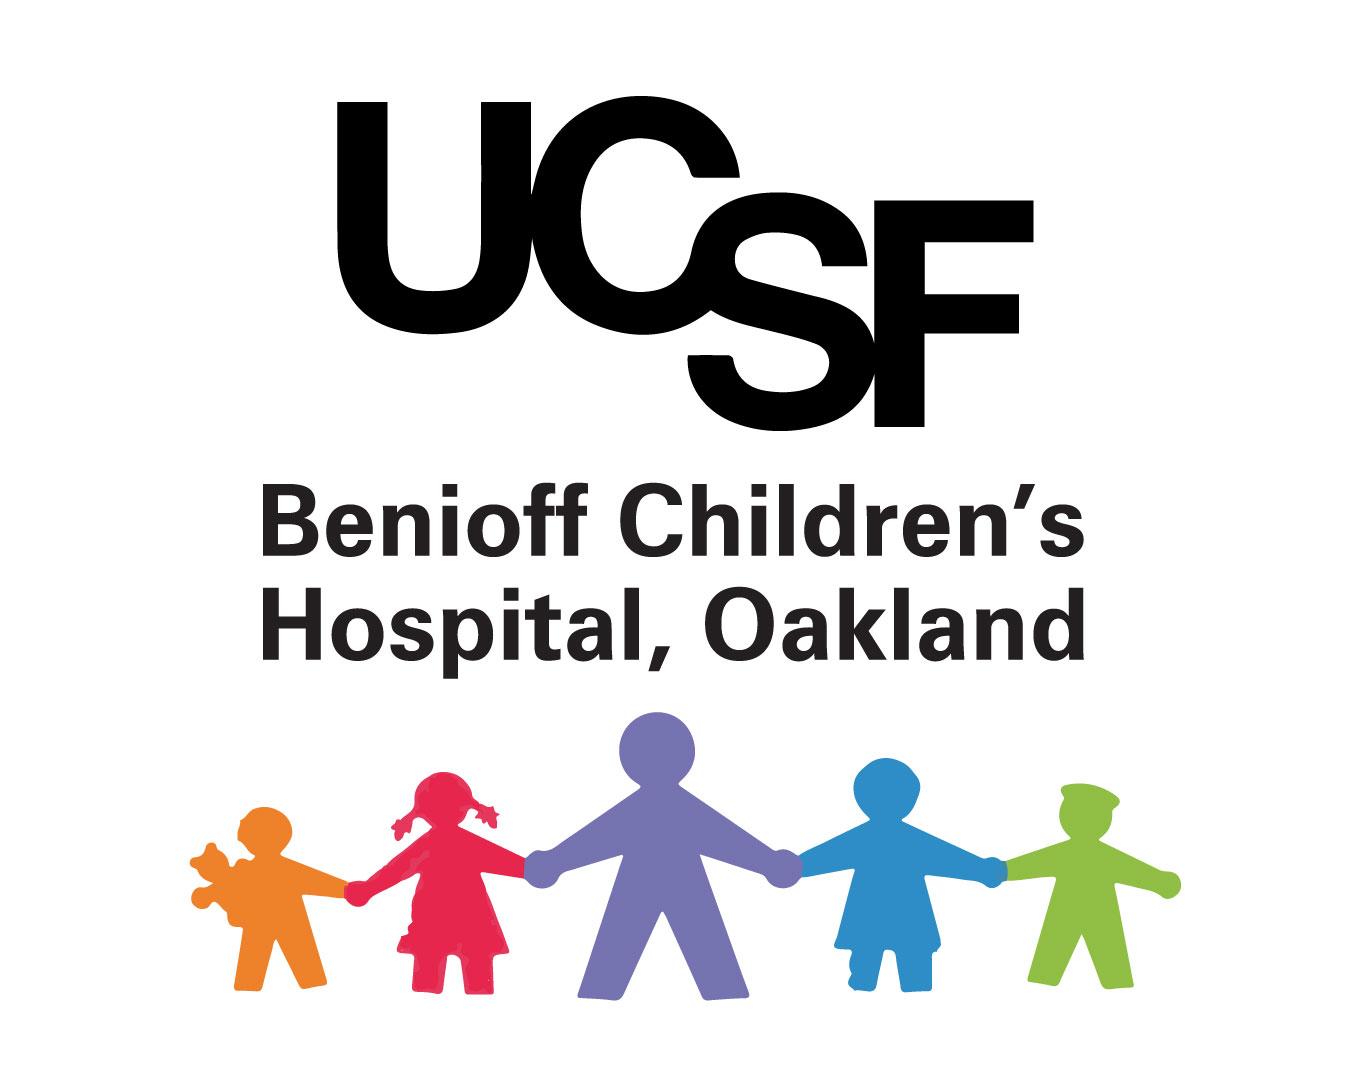 PH-UCSF-Beniof-Childrens-Hospital